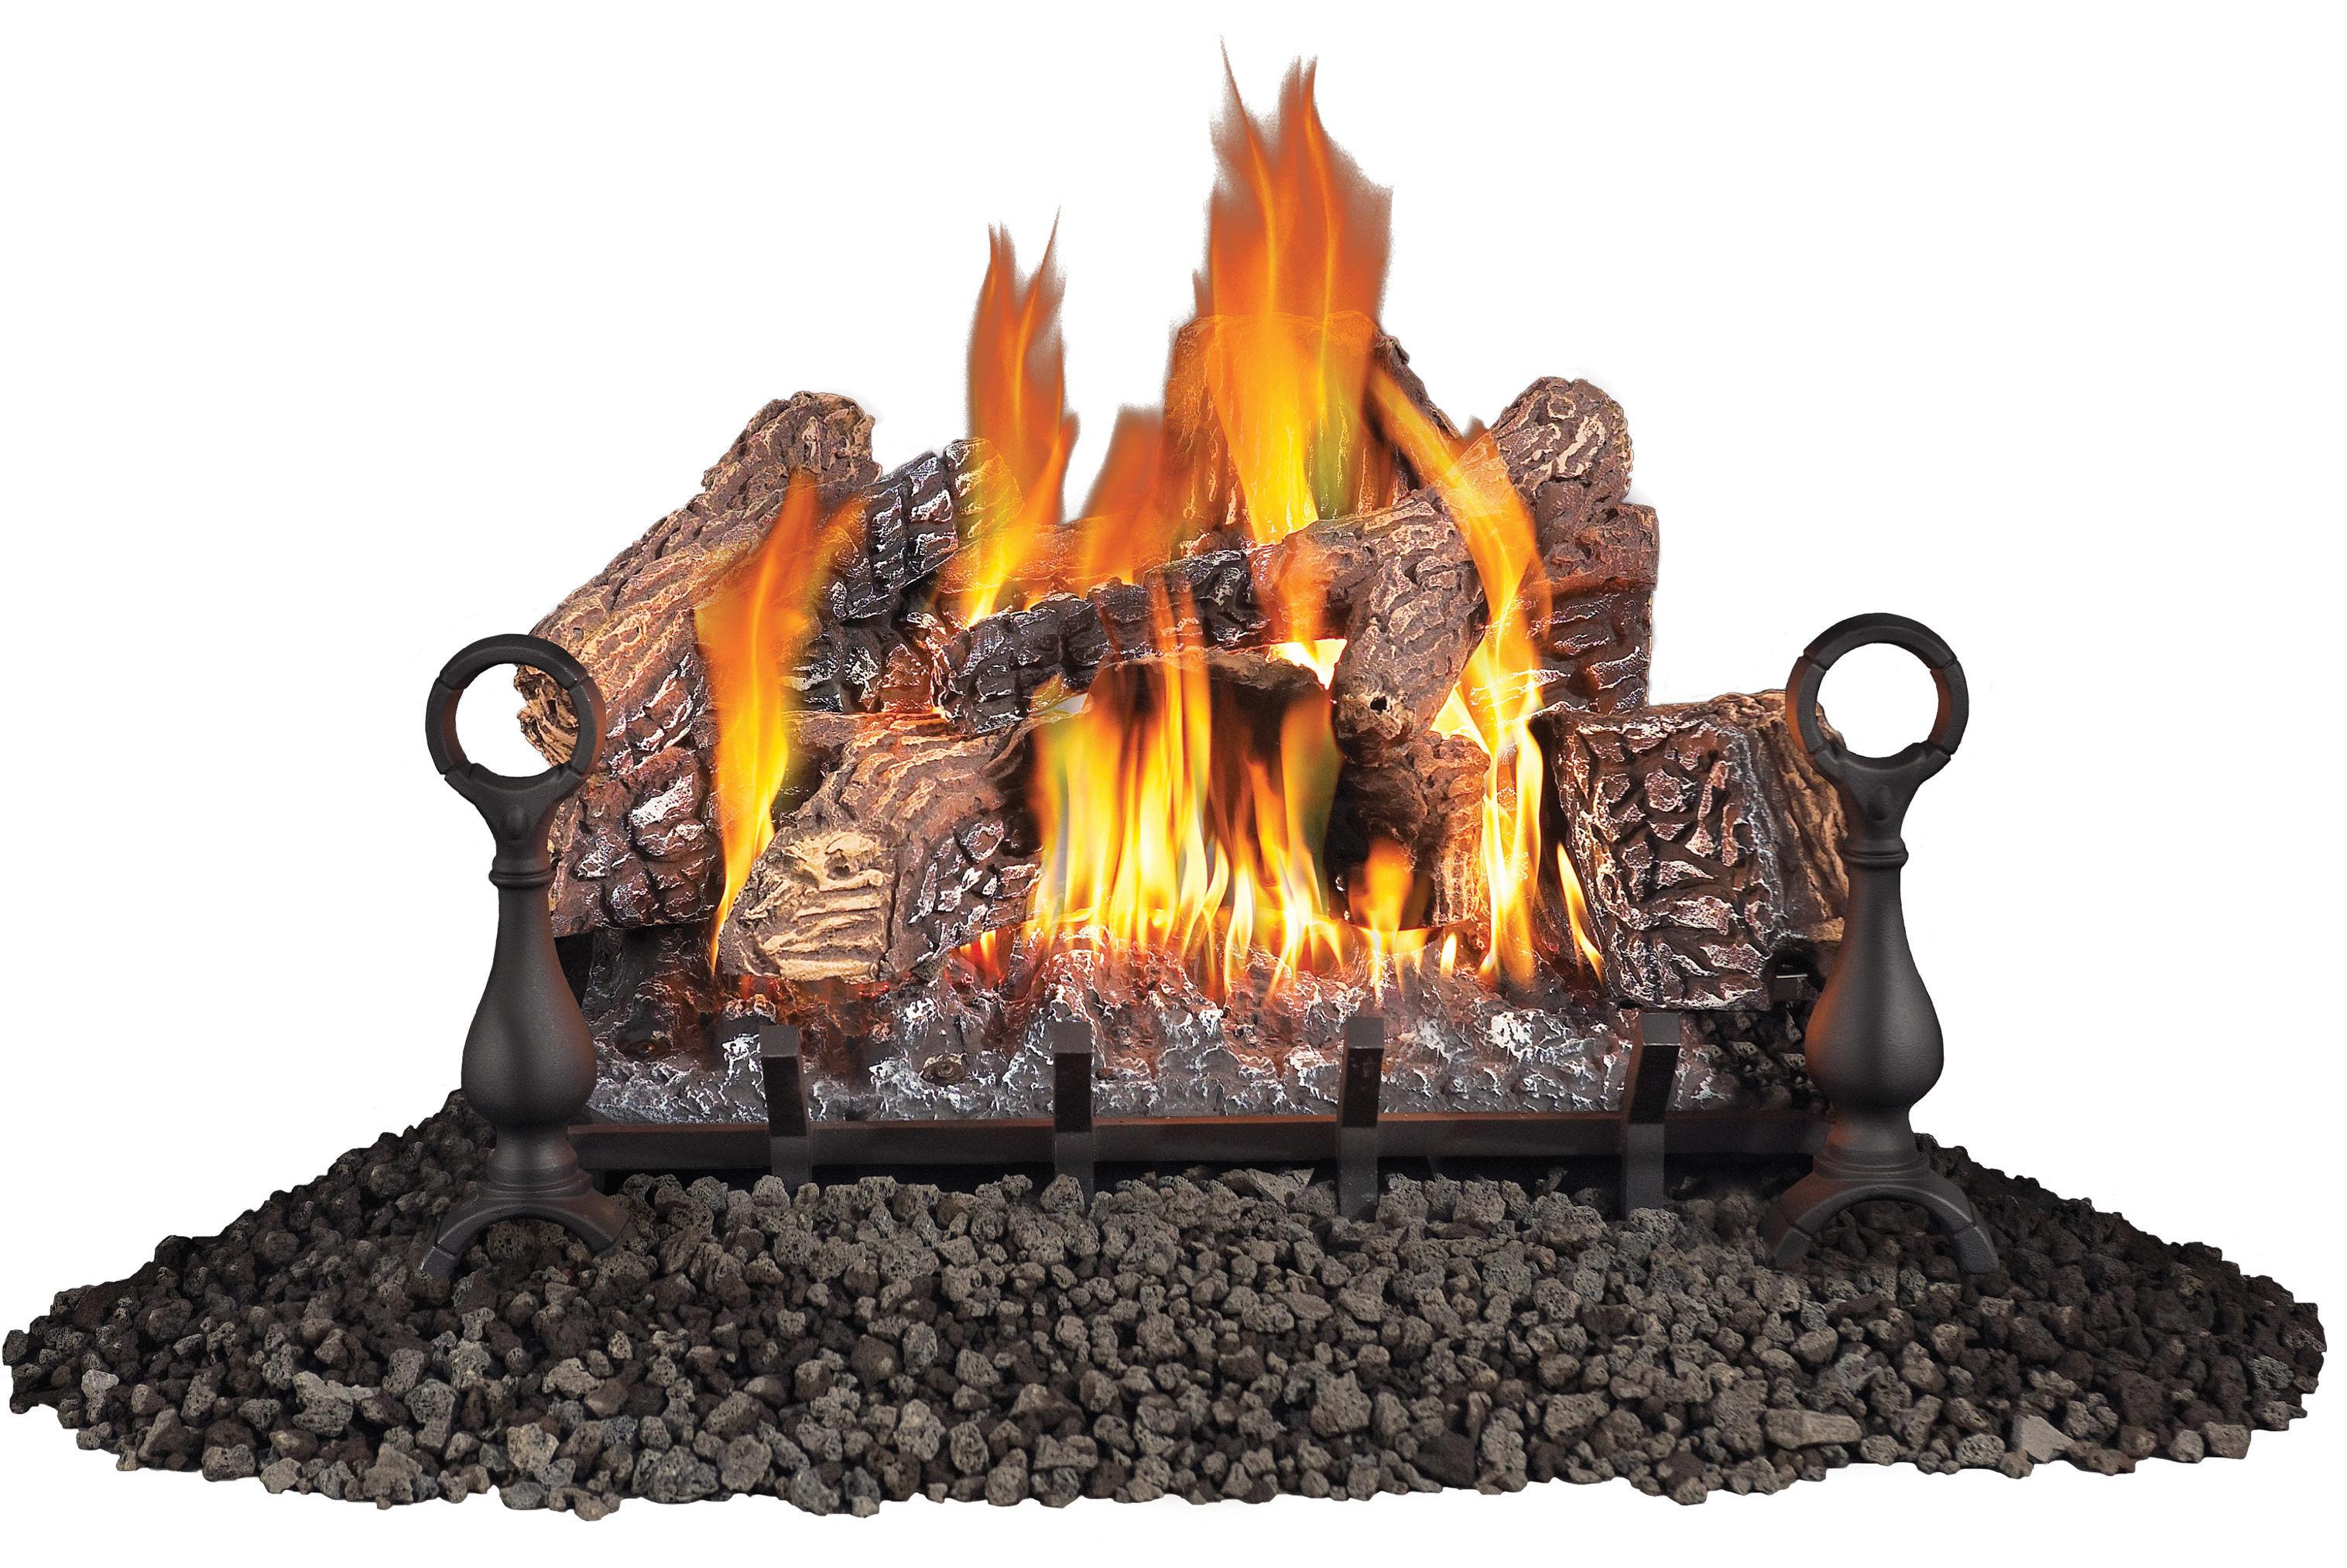 Картинка огонь для камина на прозрачном фоне